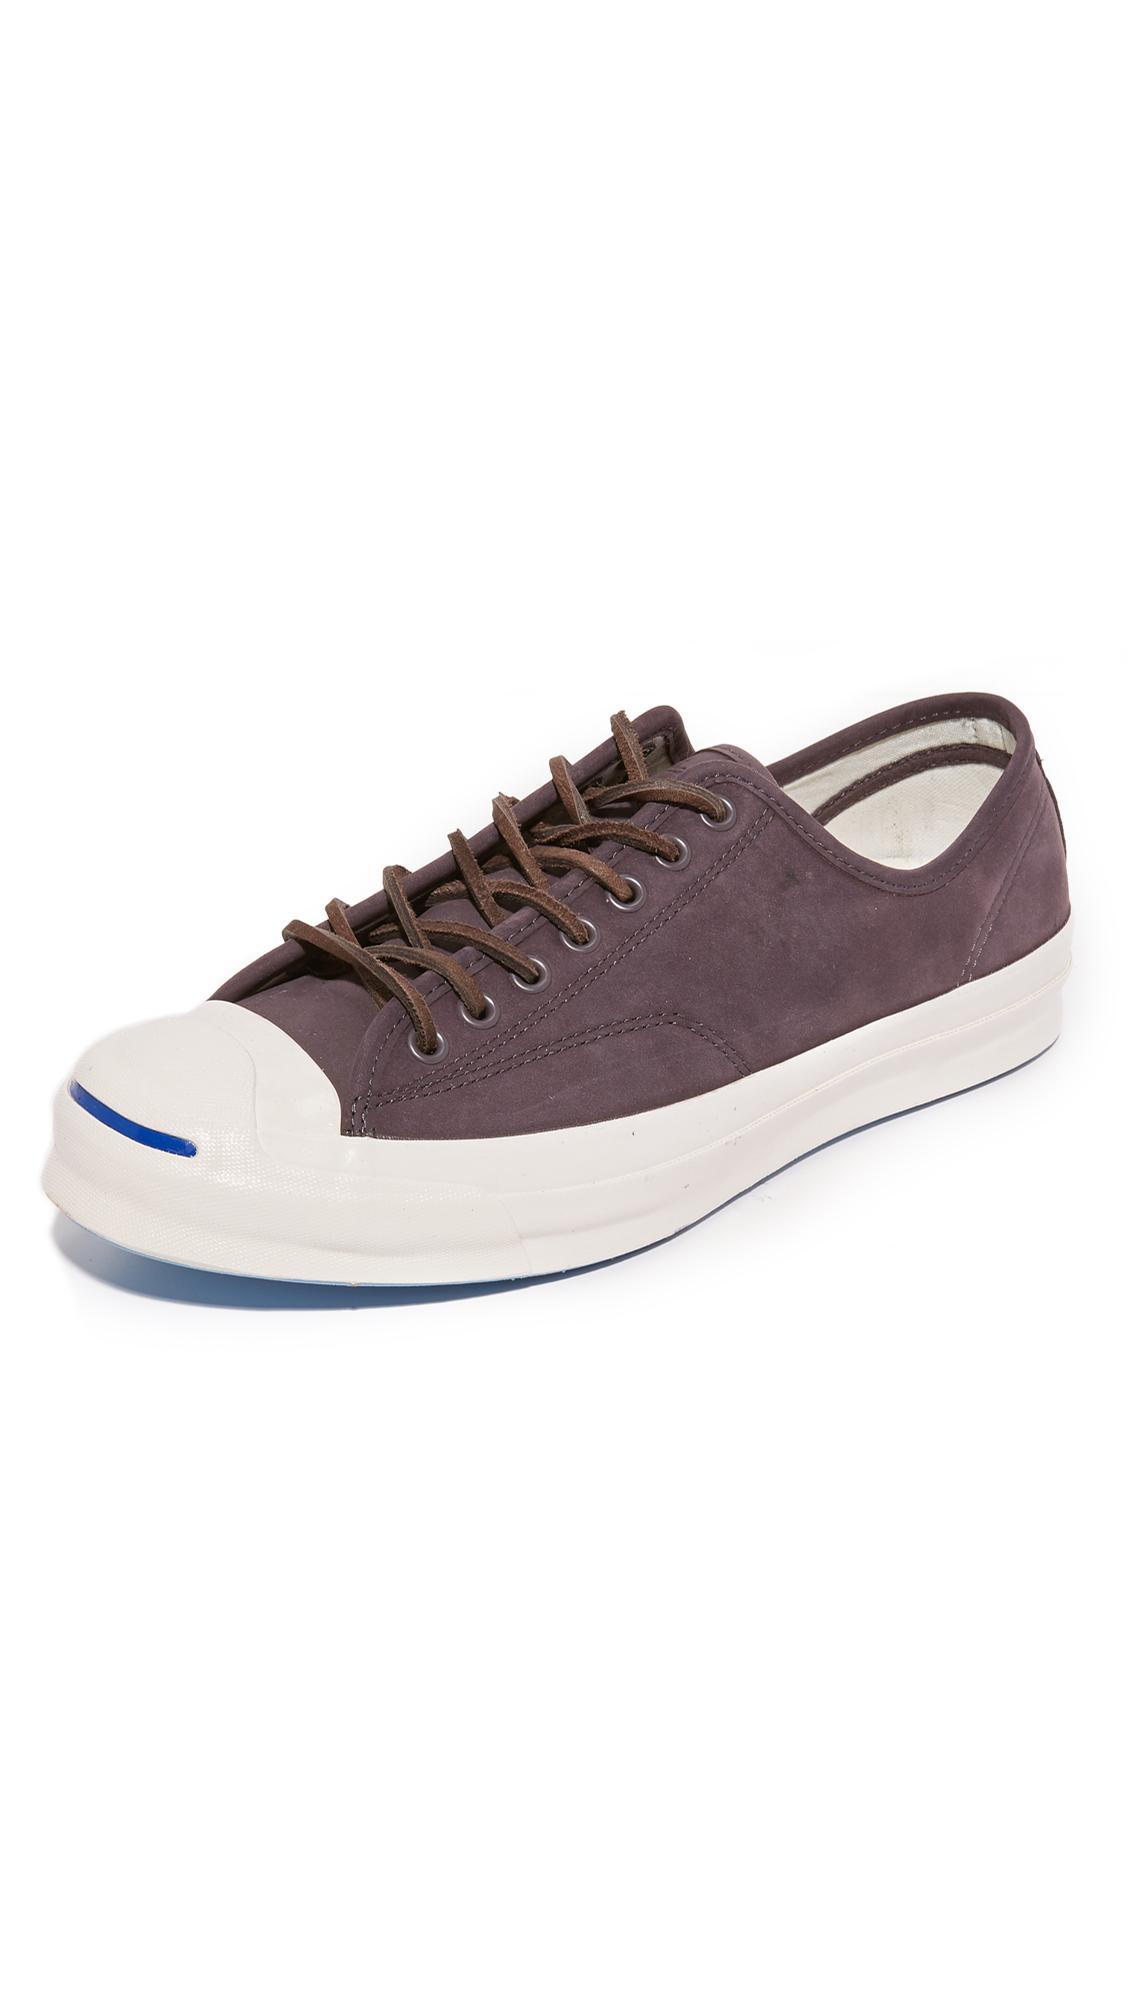 59c58f1255cb Converse Jack Purcell Signature Nubuck Sneakers In Dusk Grey Dusk Grey Egret